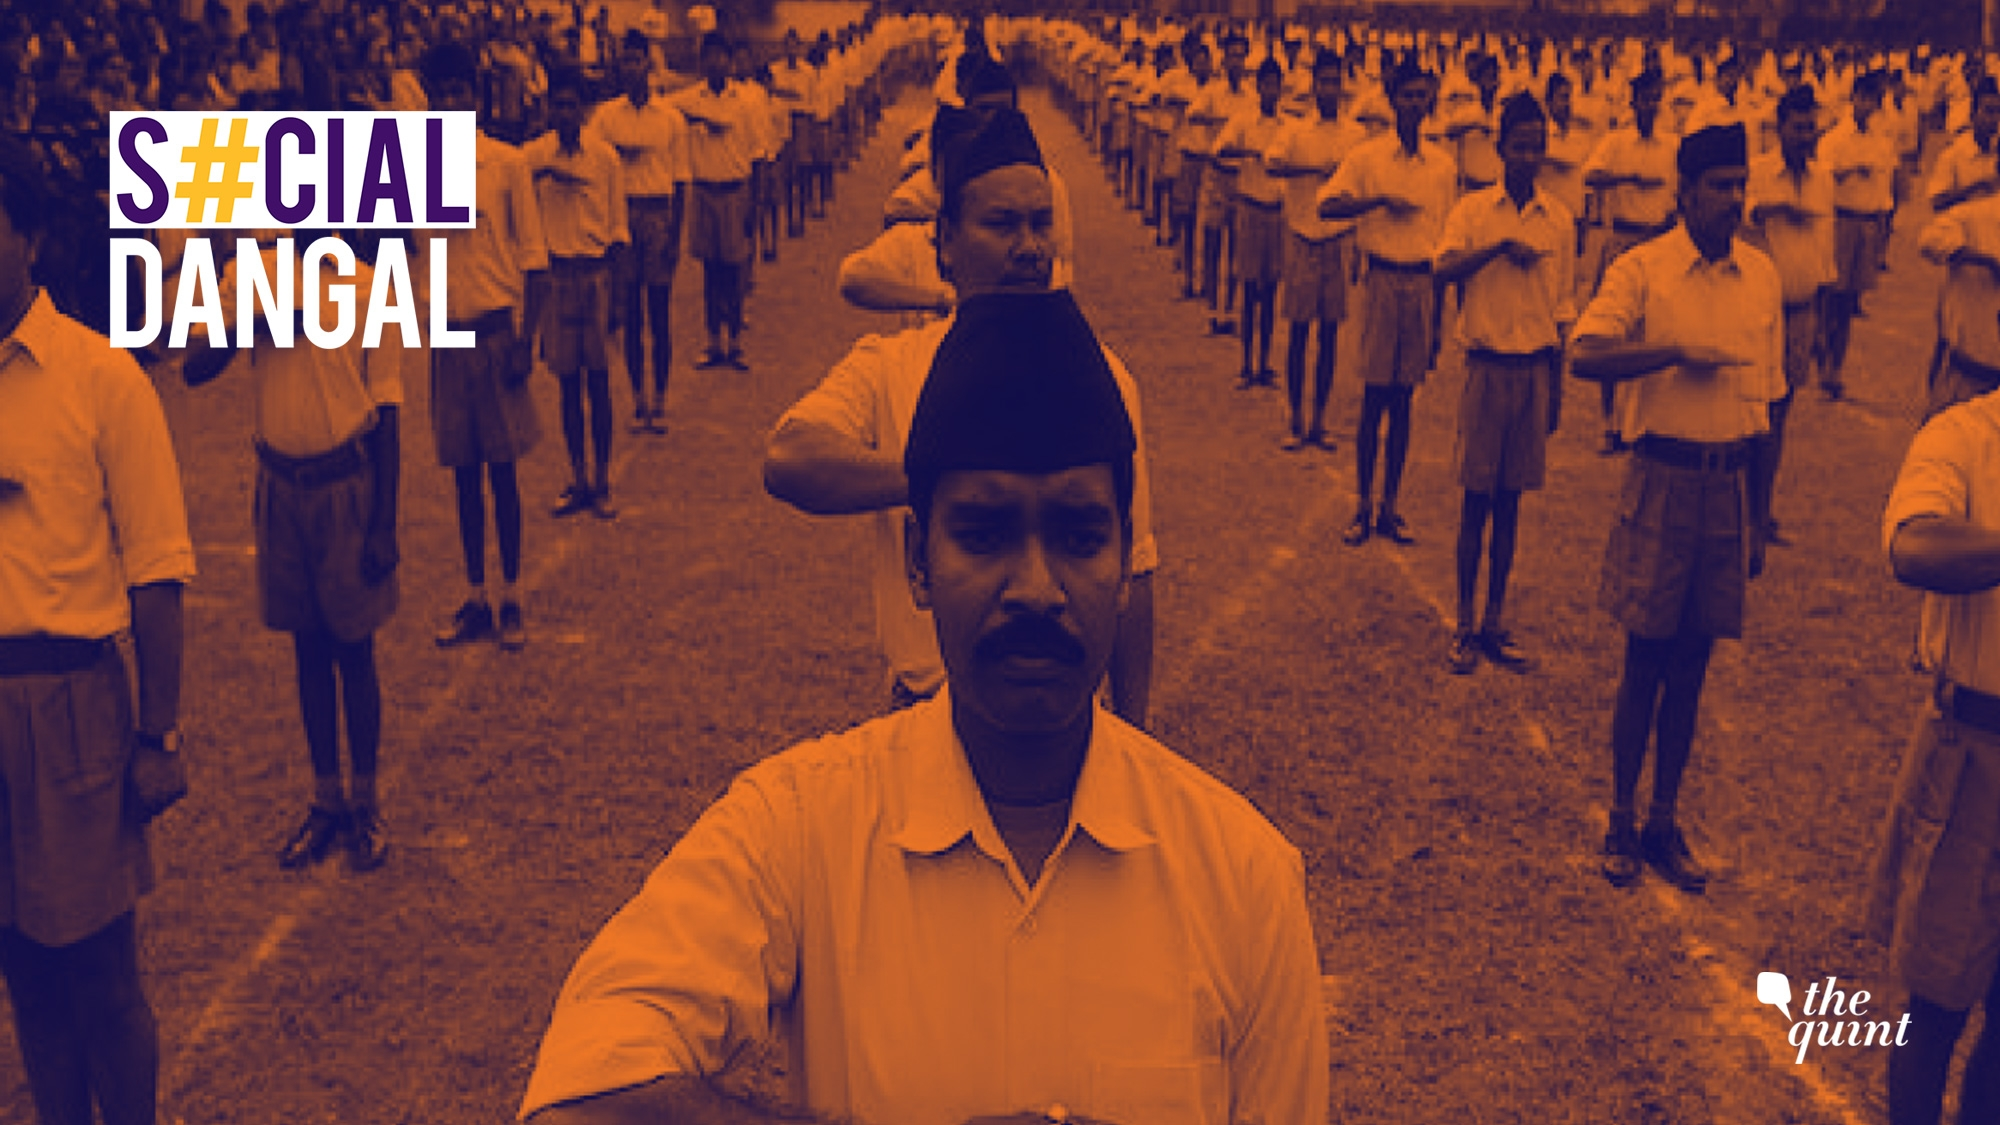 Cong Calls RSS 'Anti-India' with #RSSVsIndia, Twitterati Respond